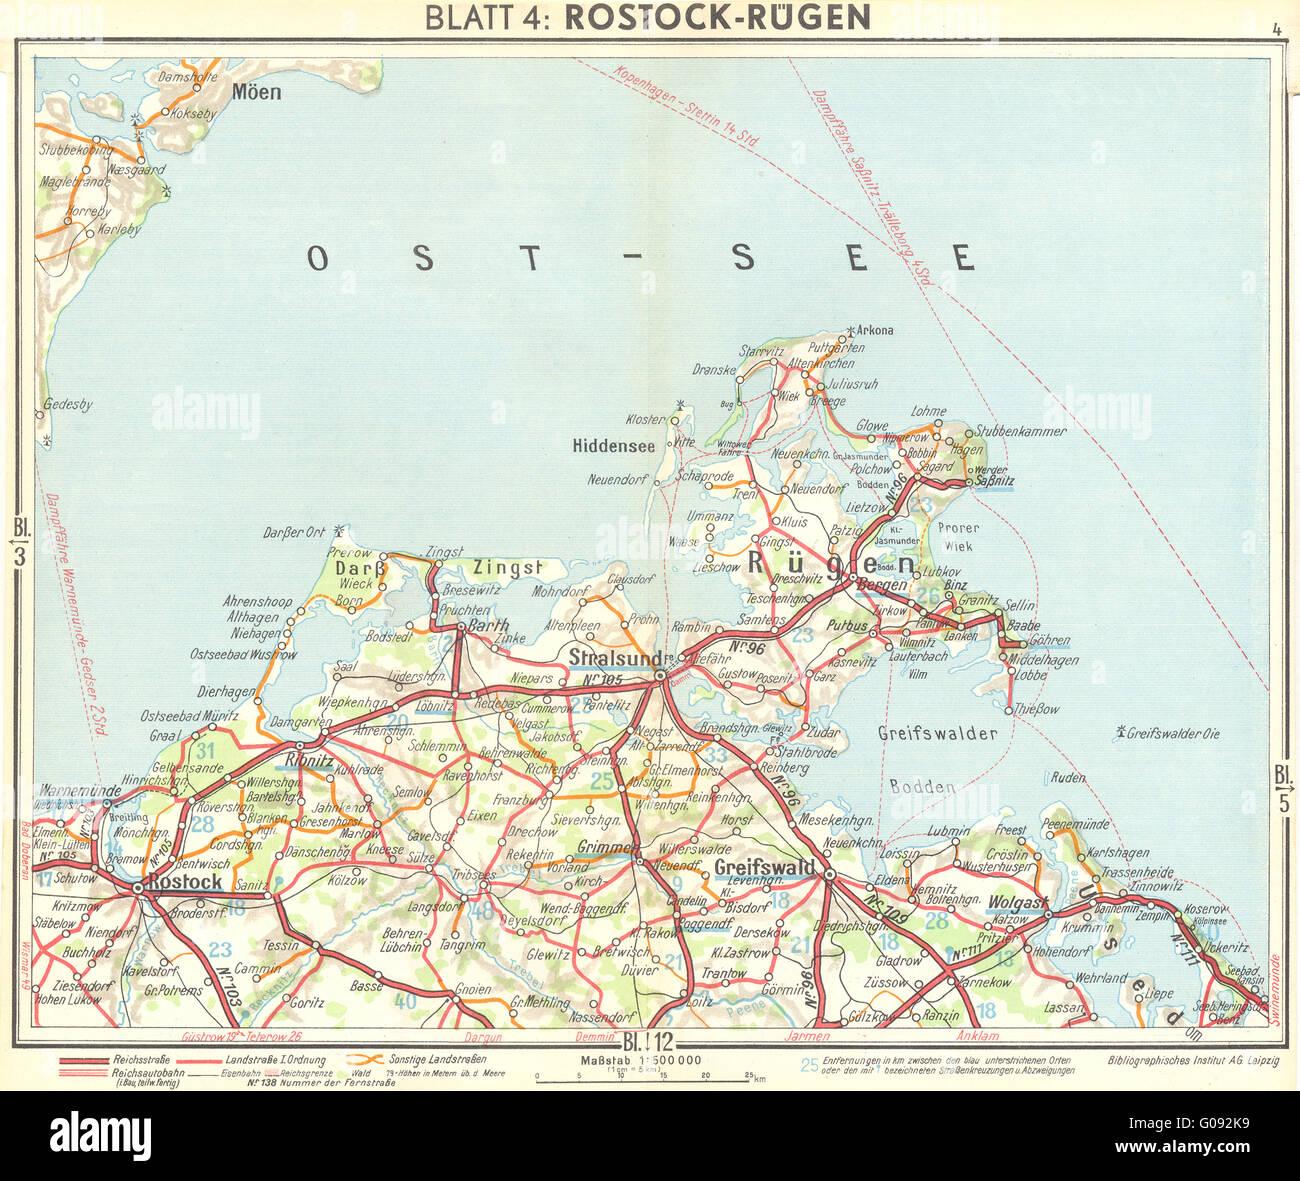 Germany Rostock Rugen 1936 Vintage Map Stock Photo 103461885 Alamy